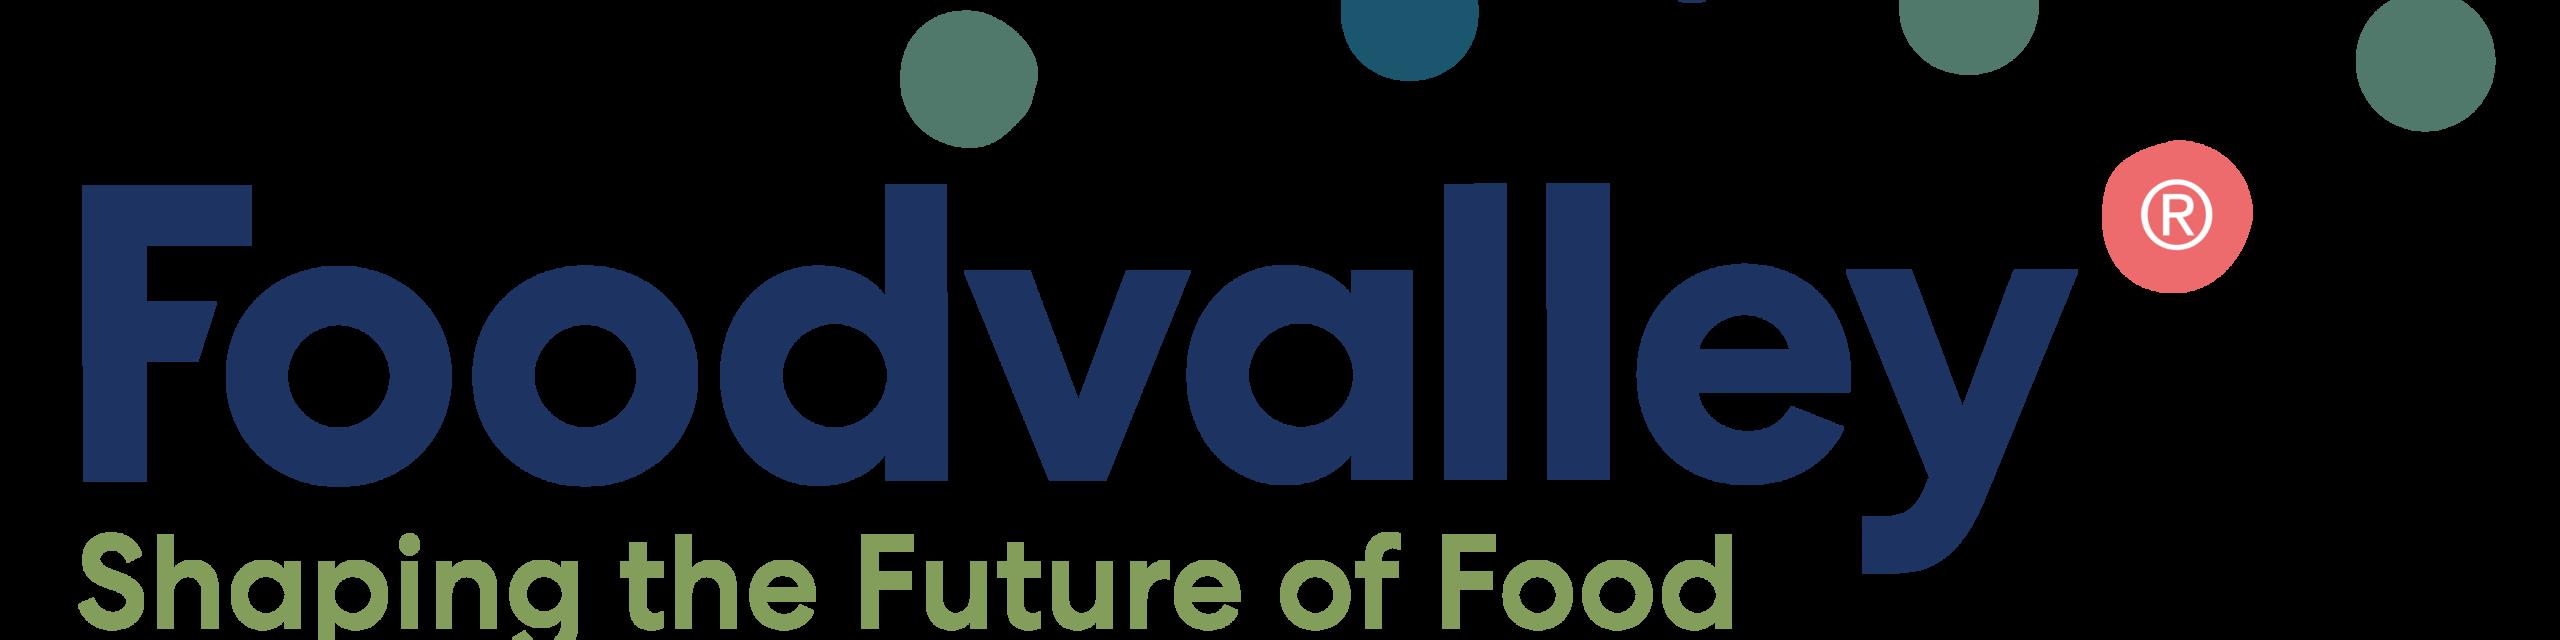 logo foodvalley